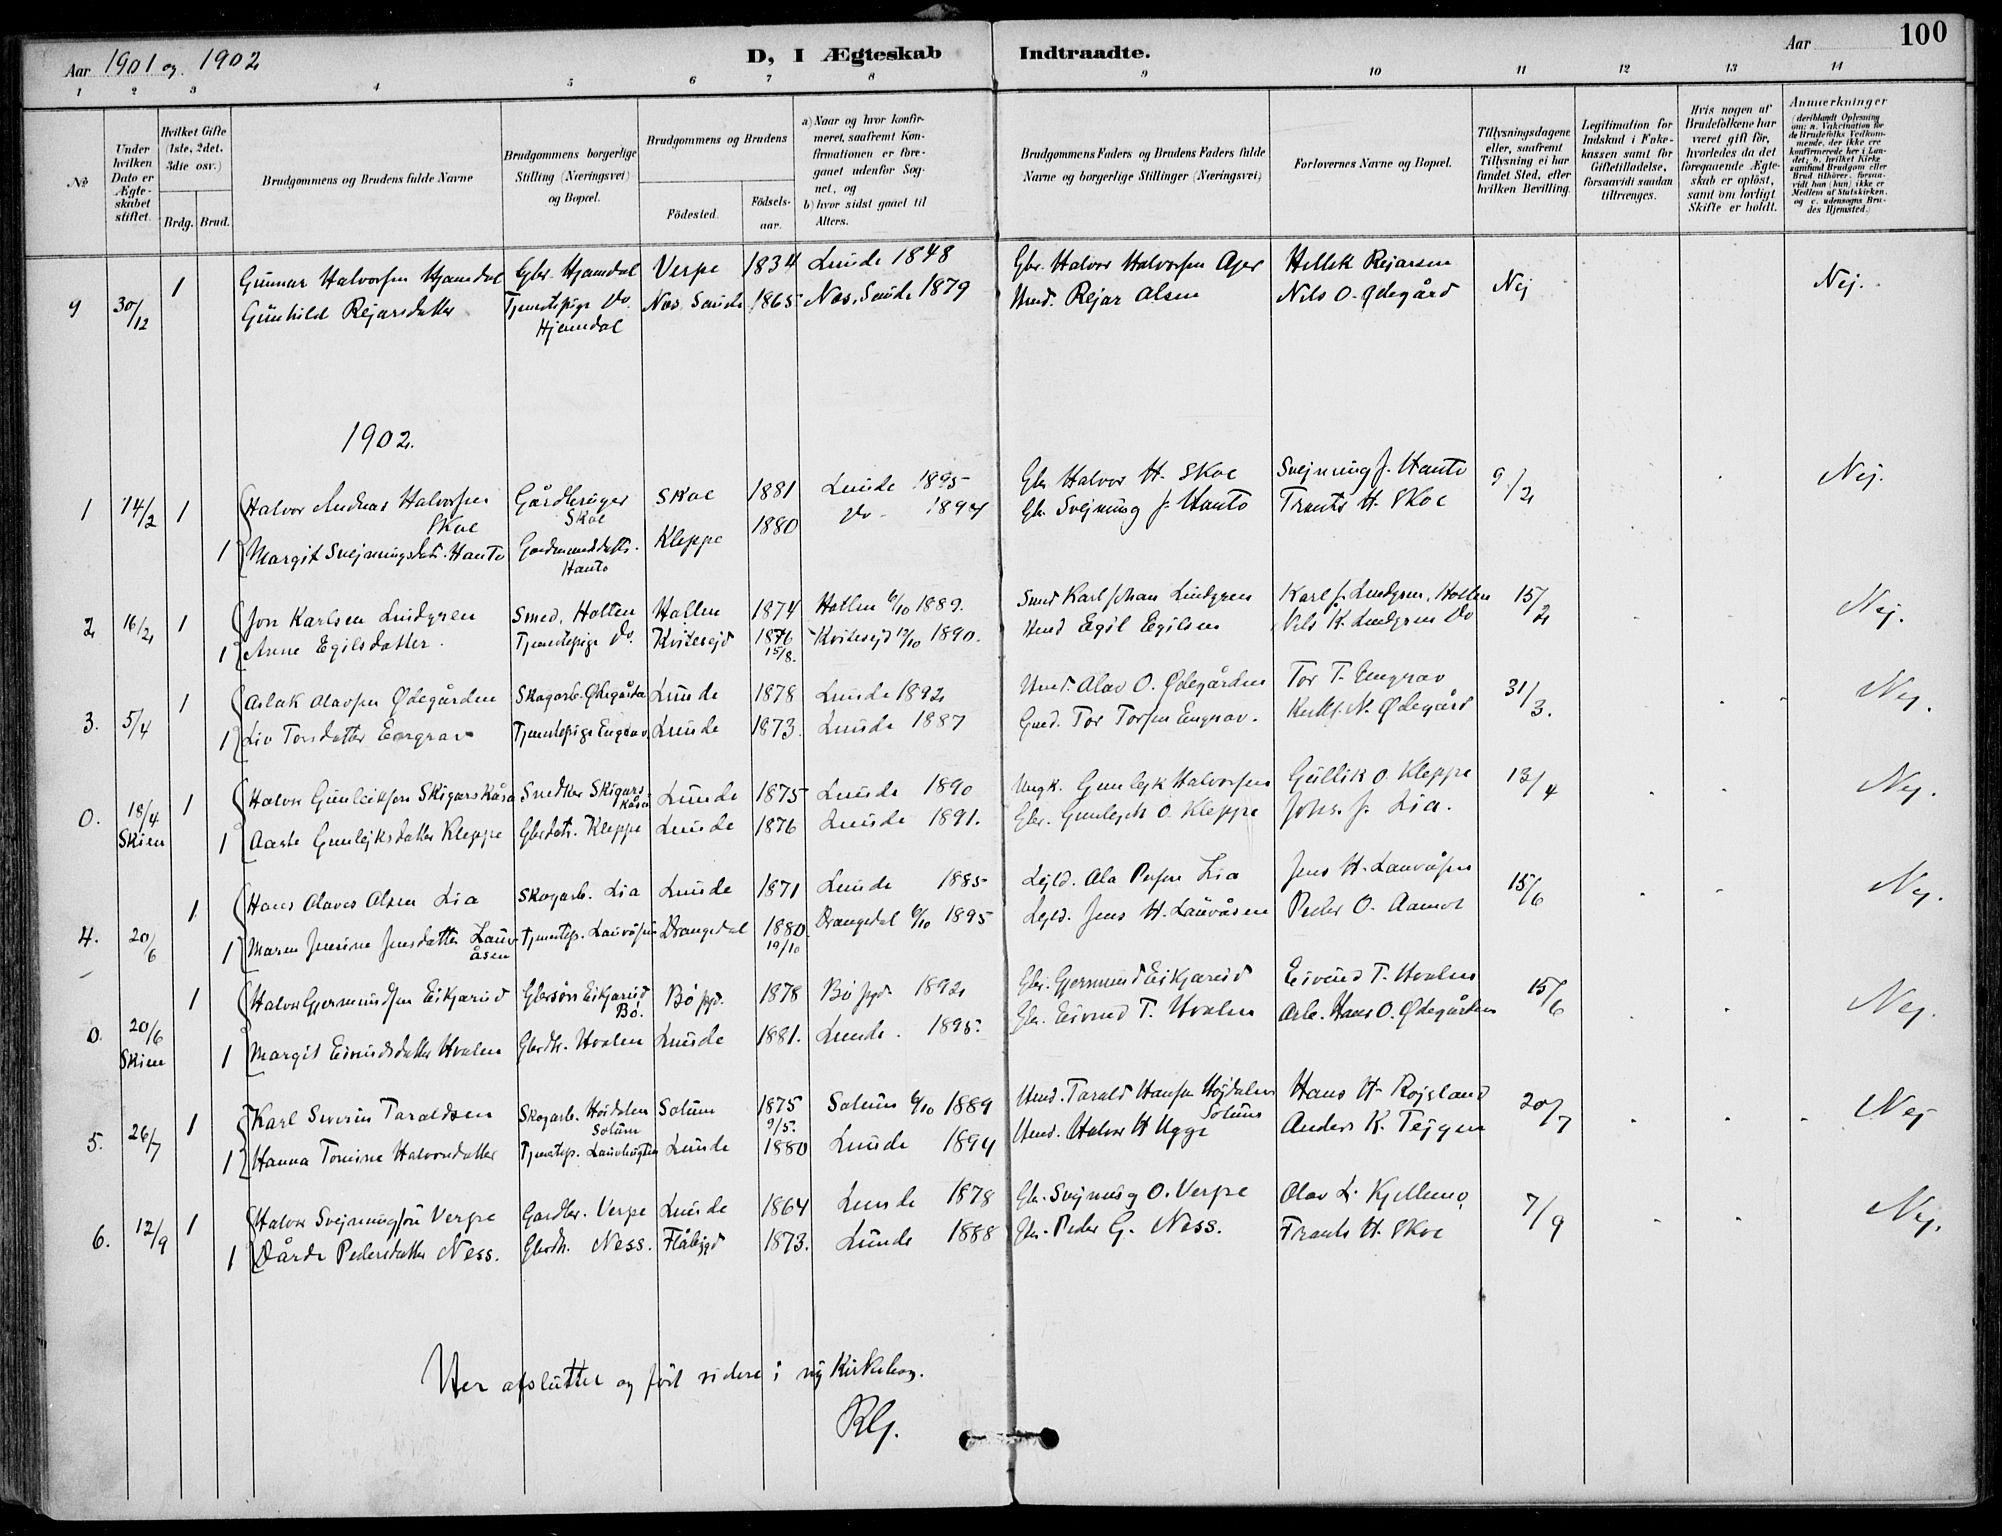 SAKO, Lunde kirkebøker, F/Fa/L0003: Ministerialbok nr. I 3, 1893-1902, s. 100